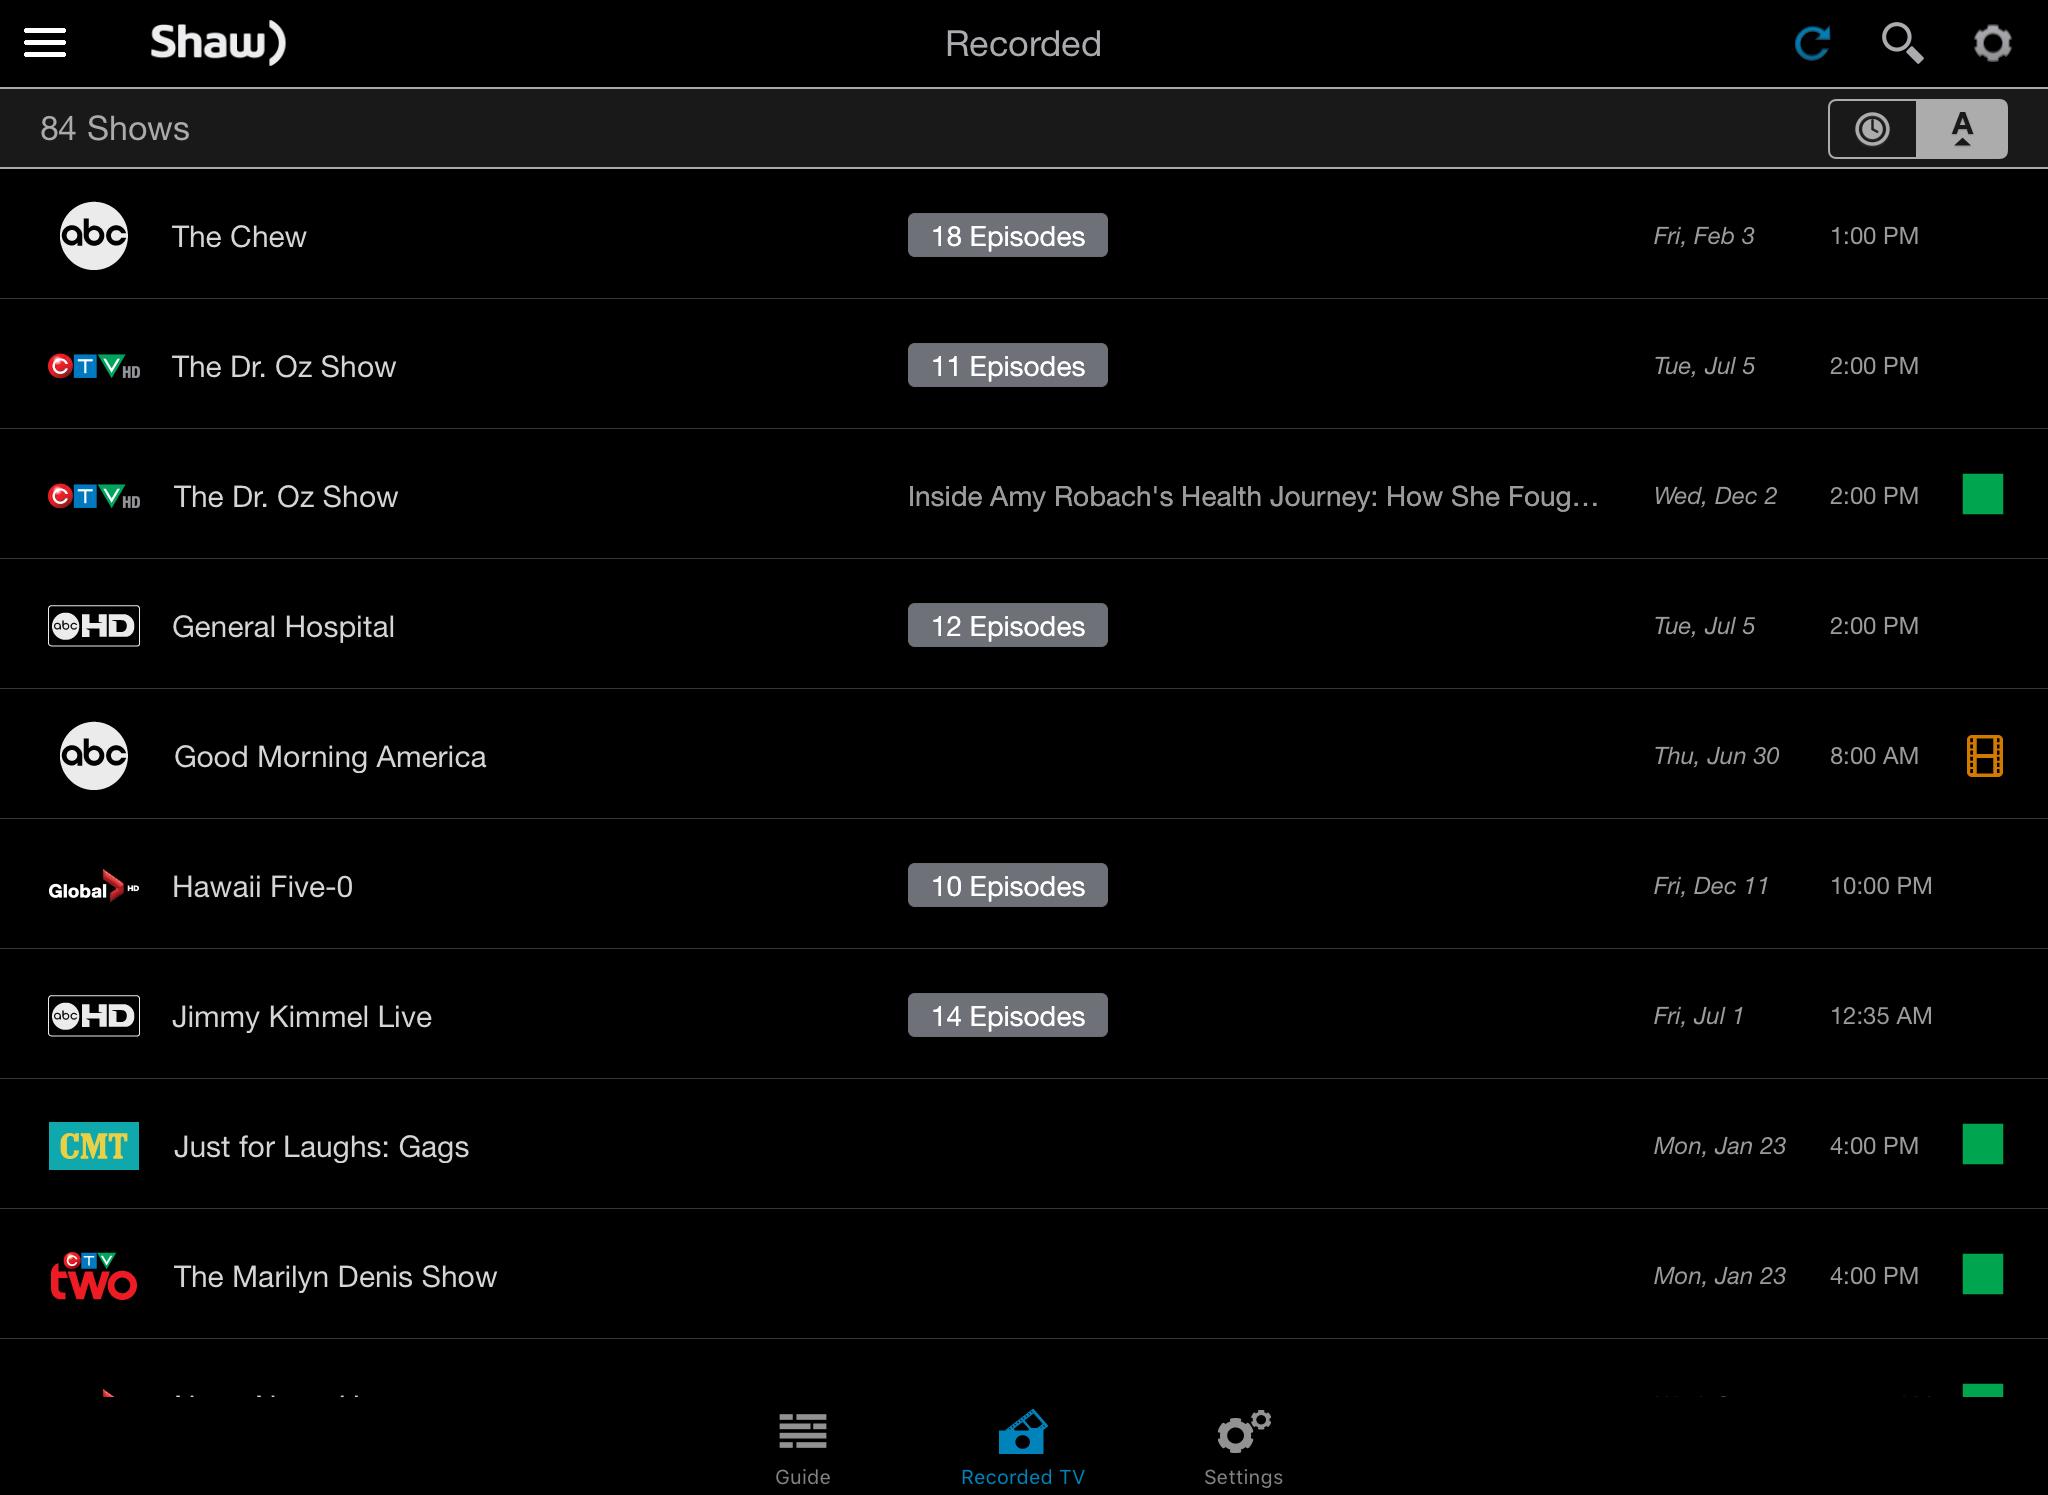 Shaw Go Gateway App Manage Recordings